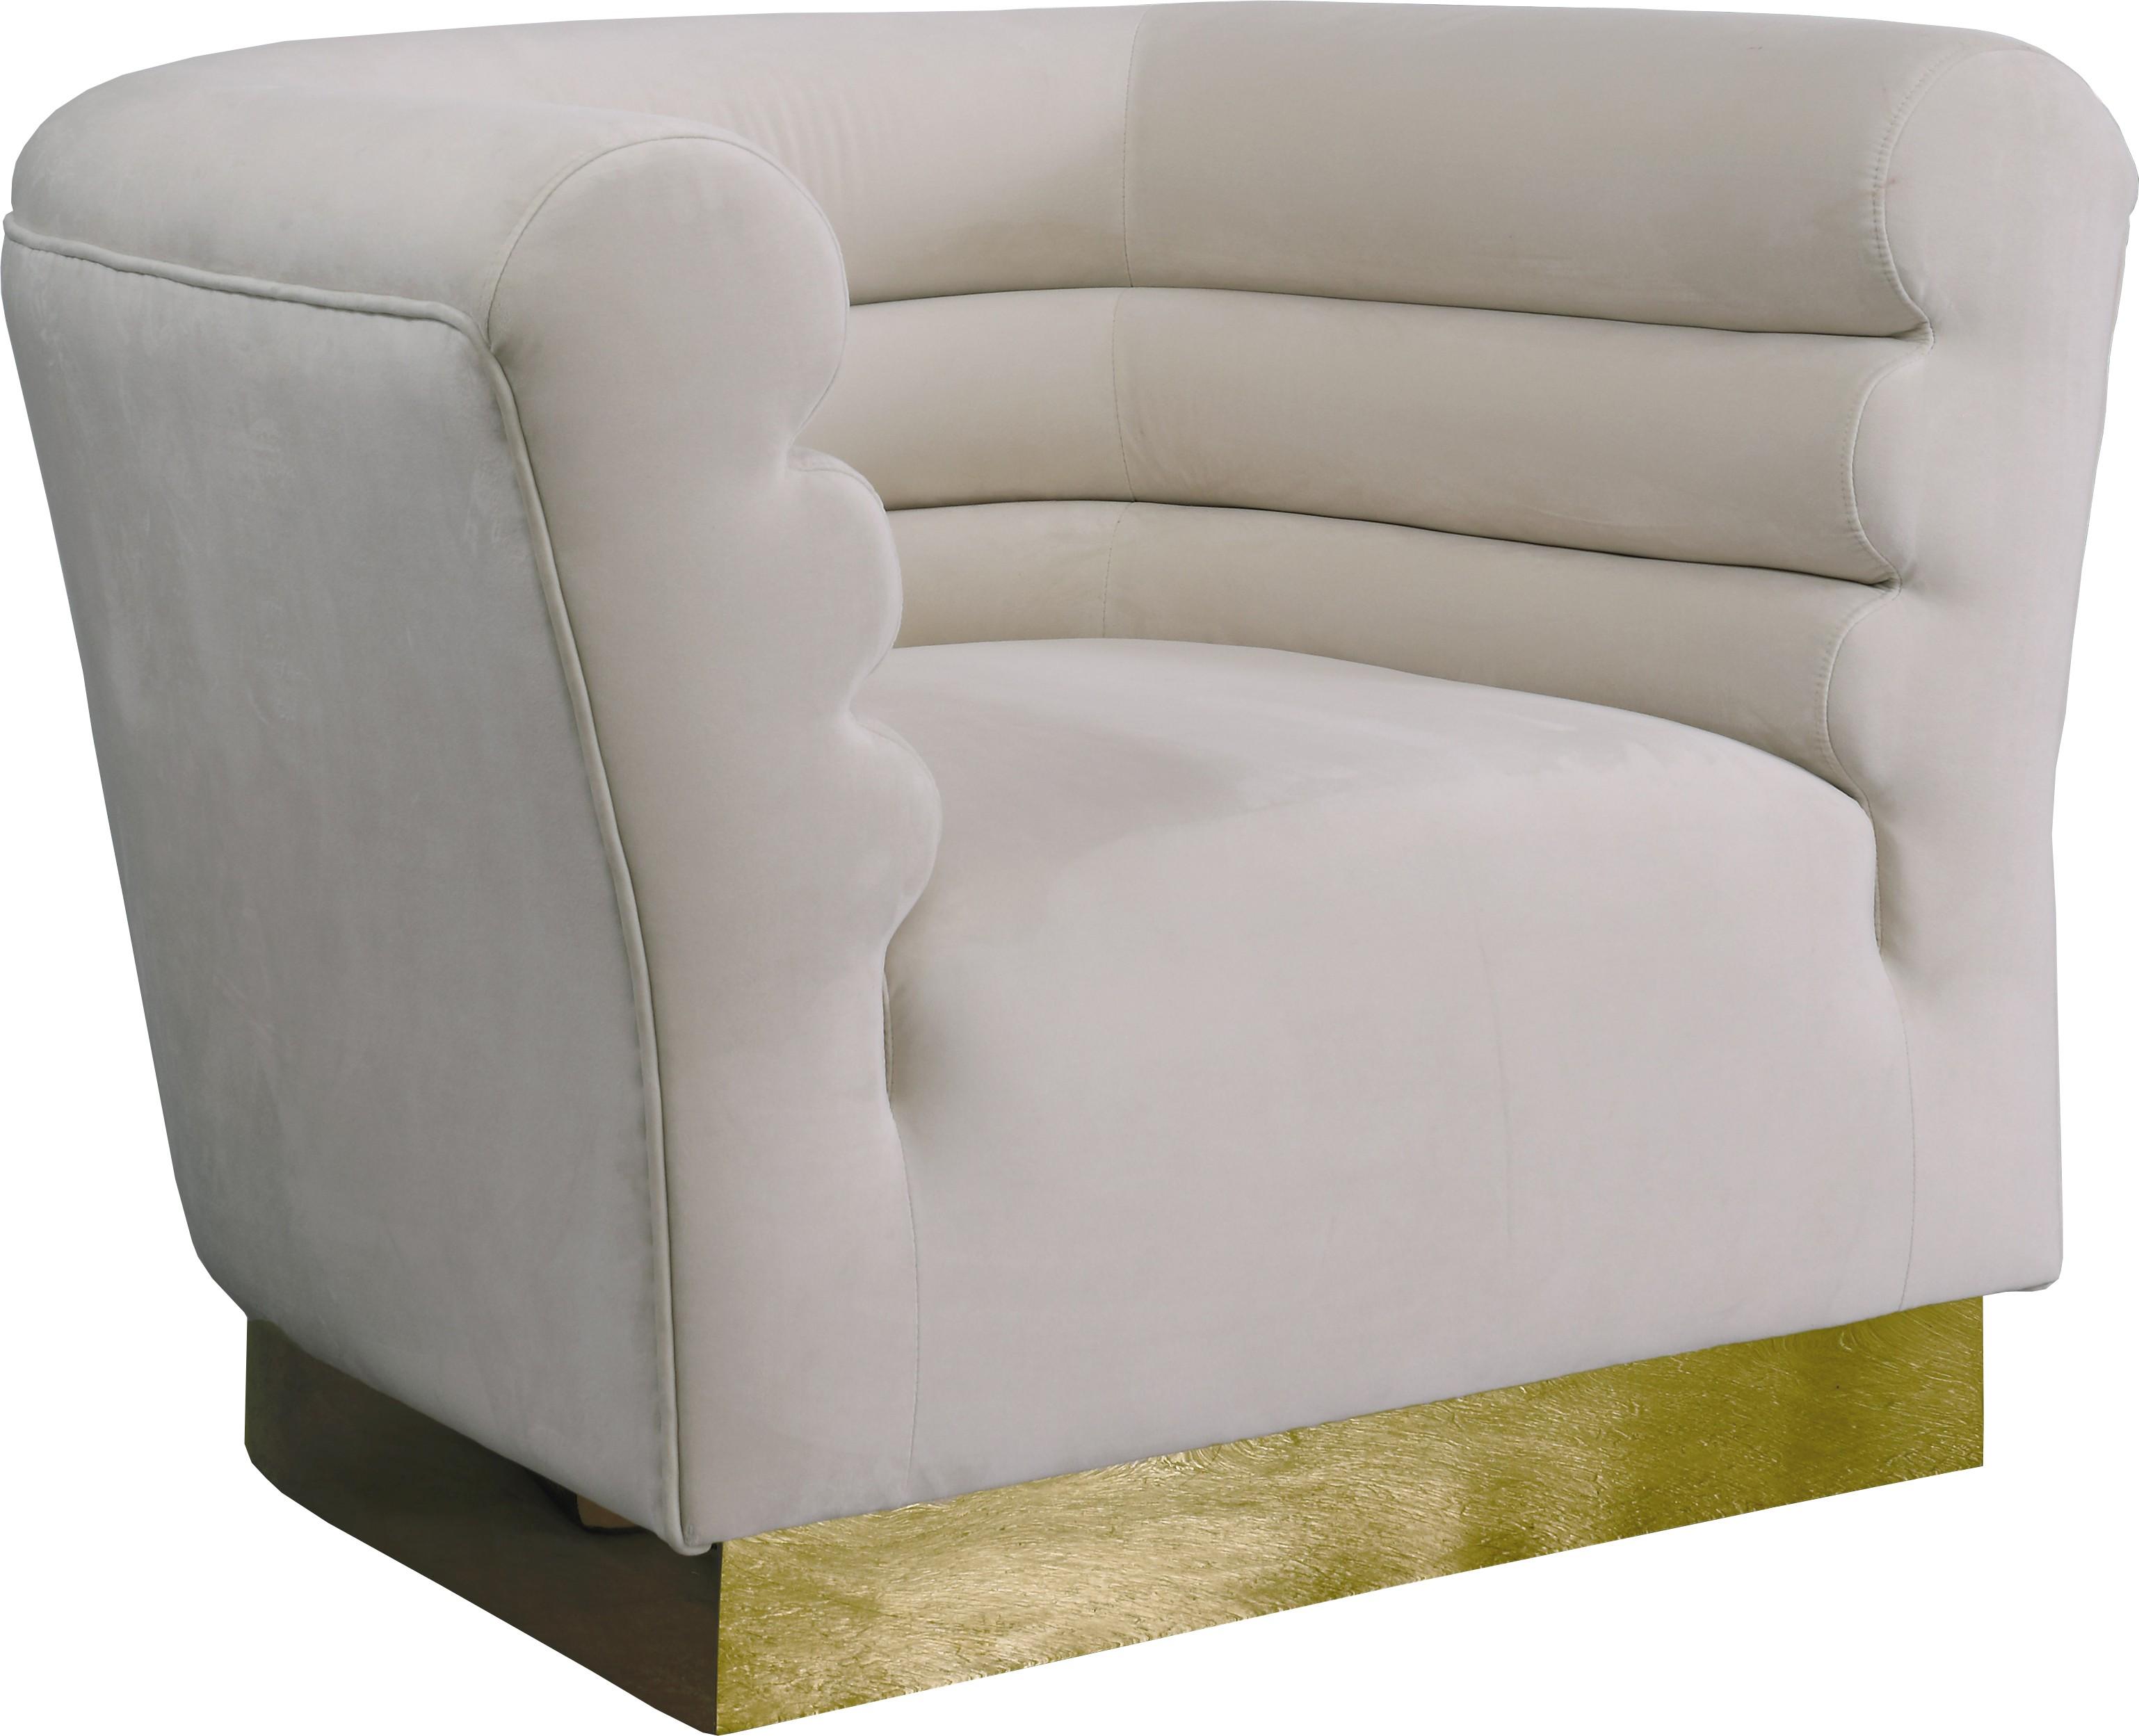 Peachy Products Furniture Plus Machost Co Dining Chair Design Ideas Machostcouk